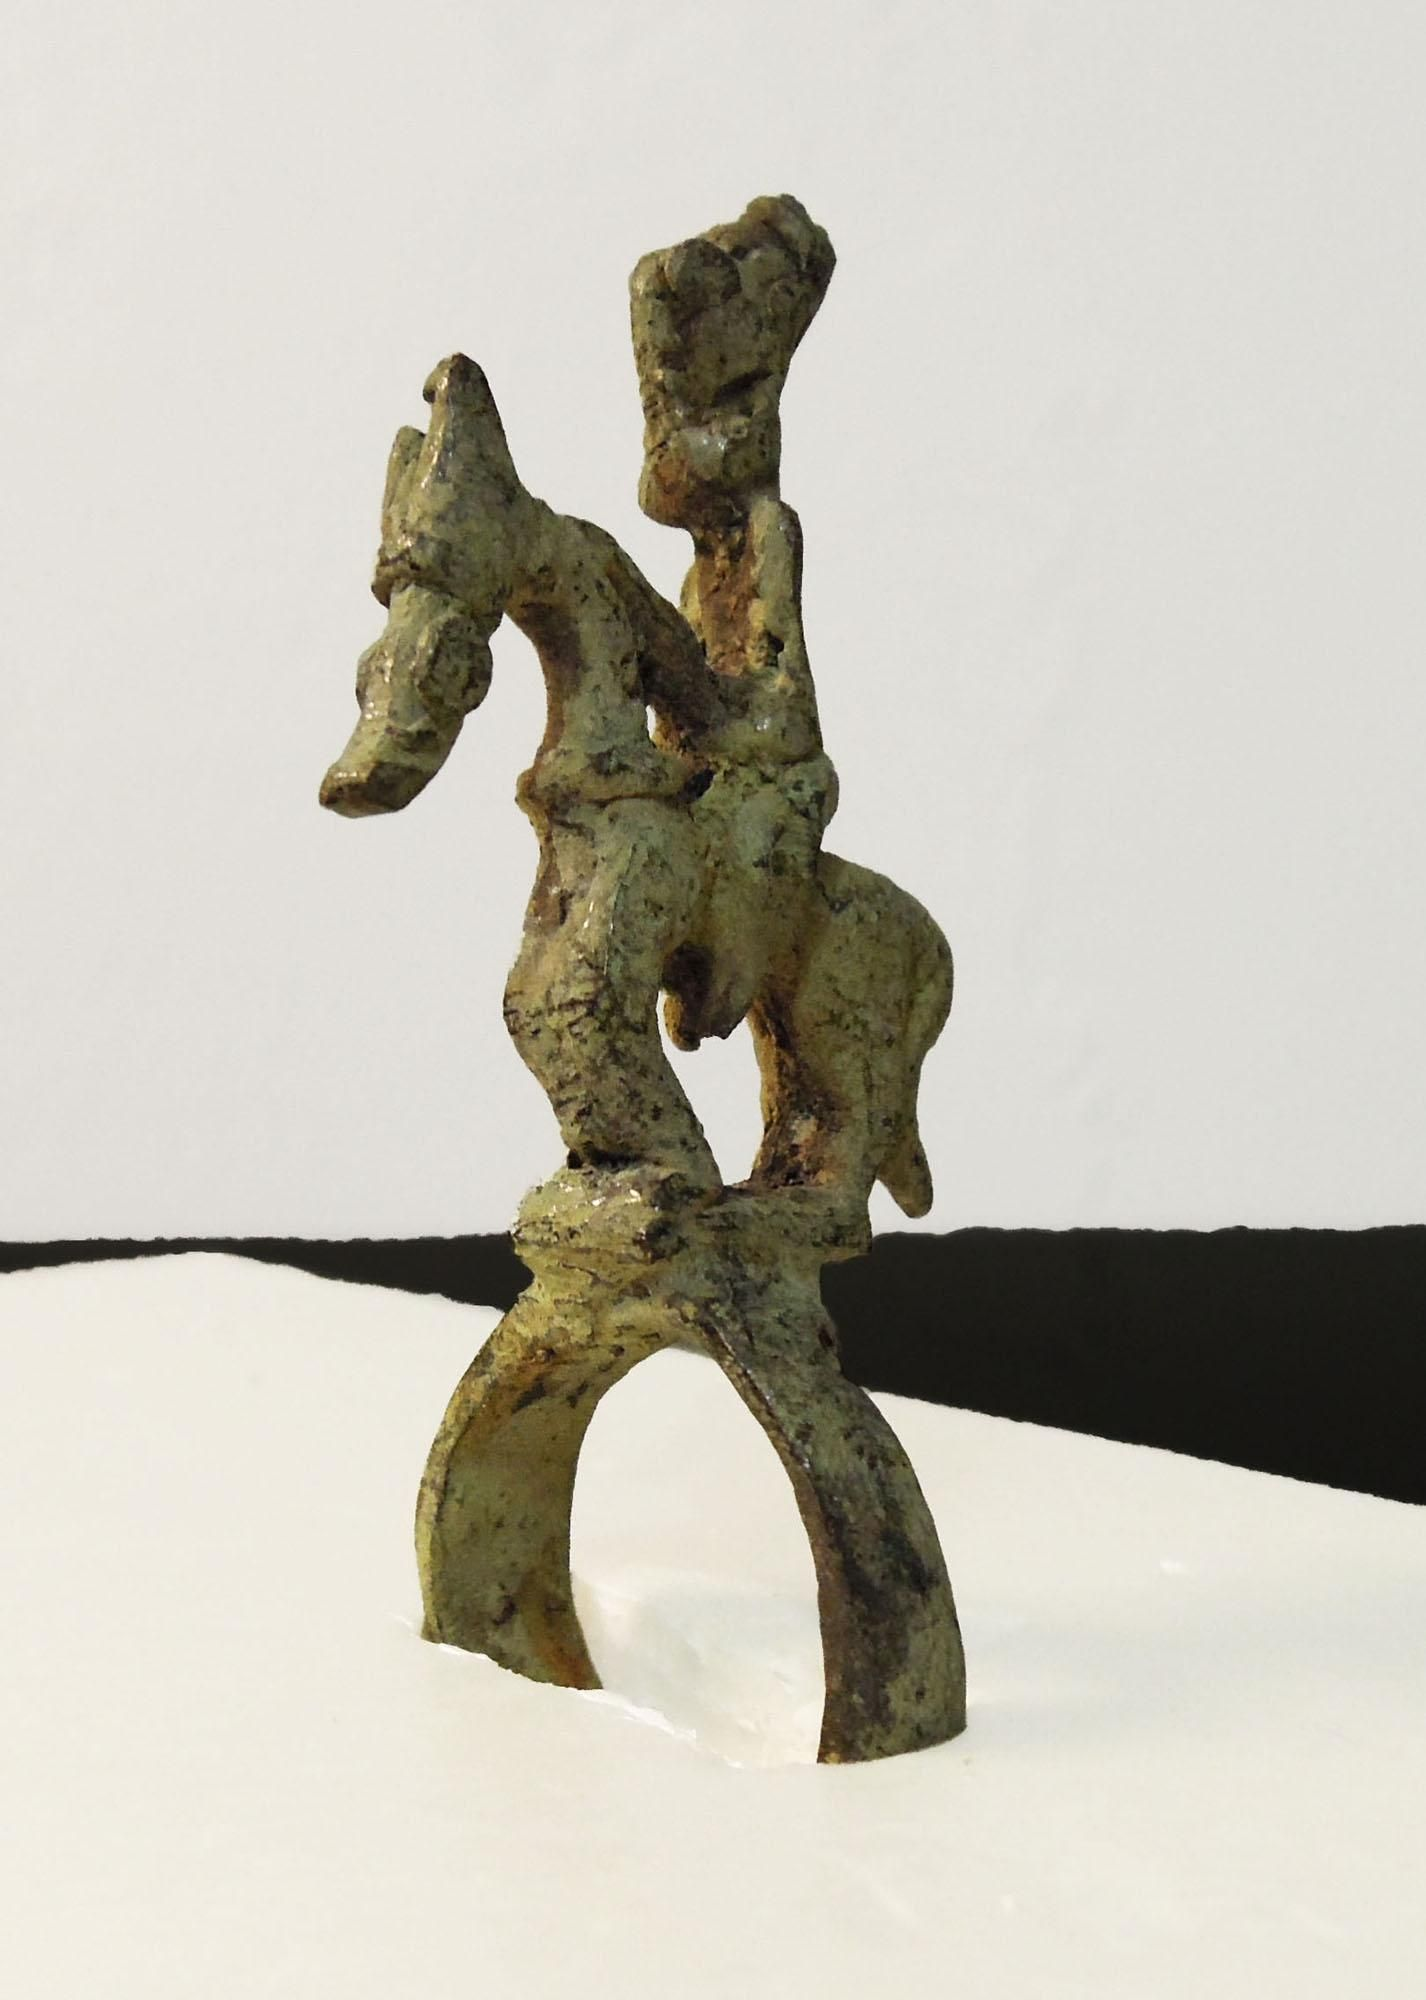 Mali. Dogon people. 1850. Ceremonial bronze ring